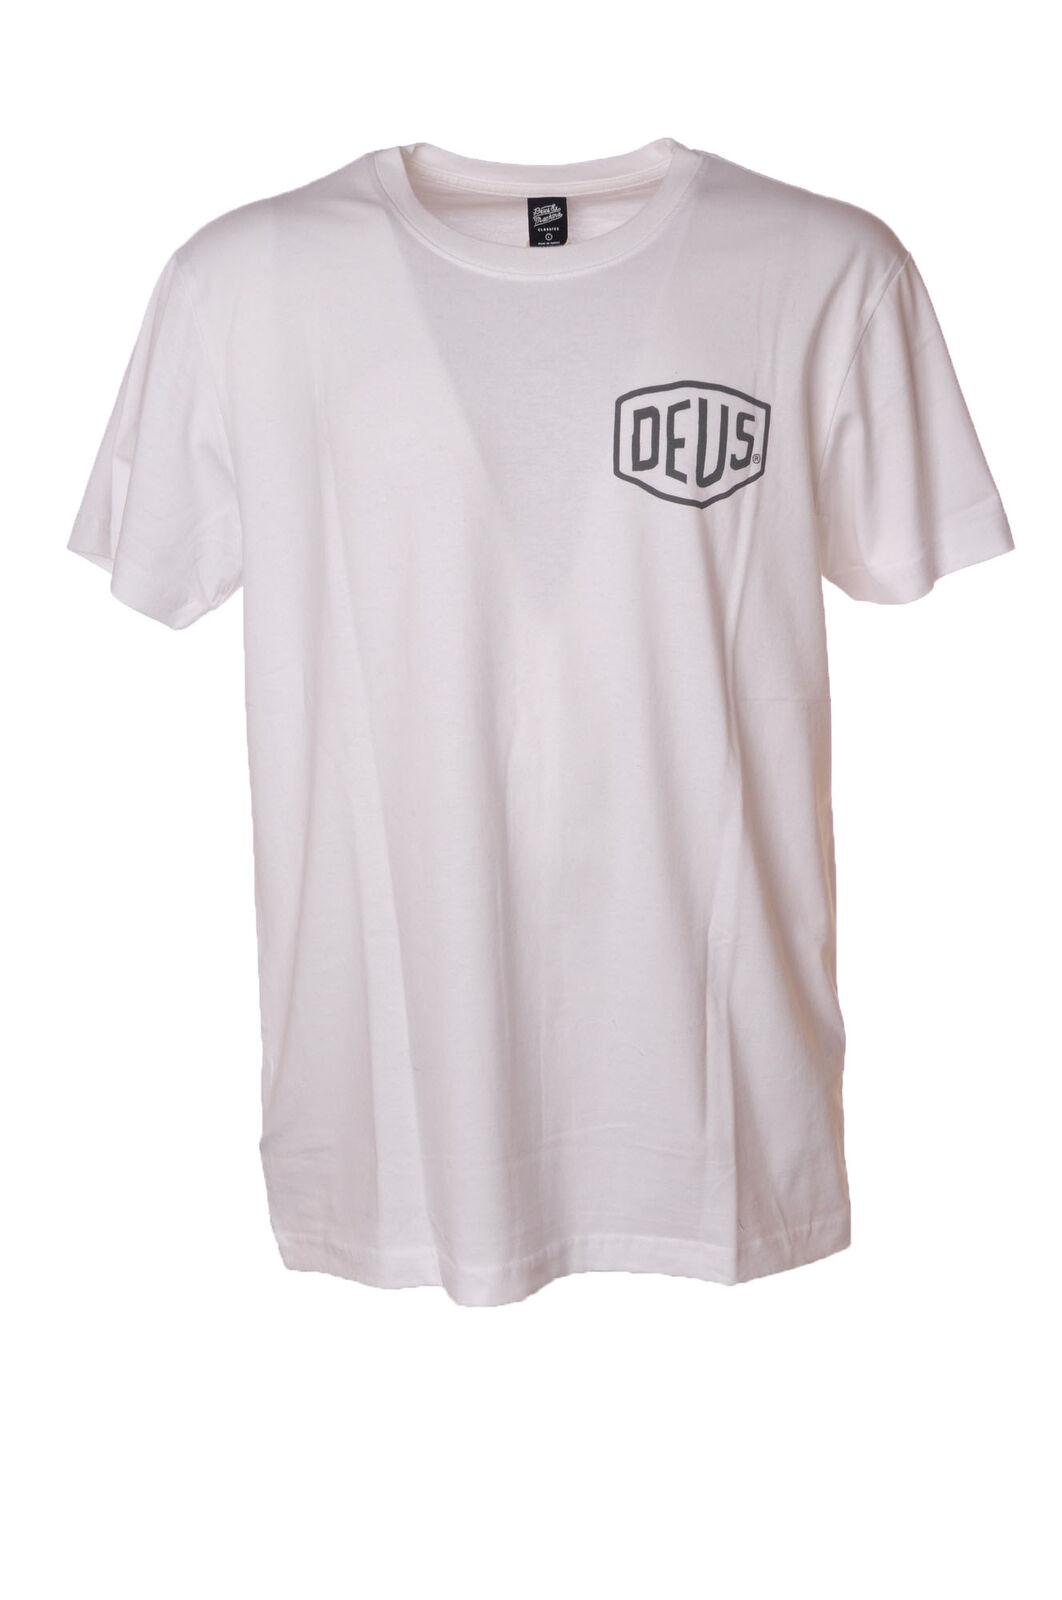 Deus - Topwear-T-shirts - Man - White - 4404215G184246